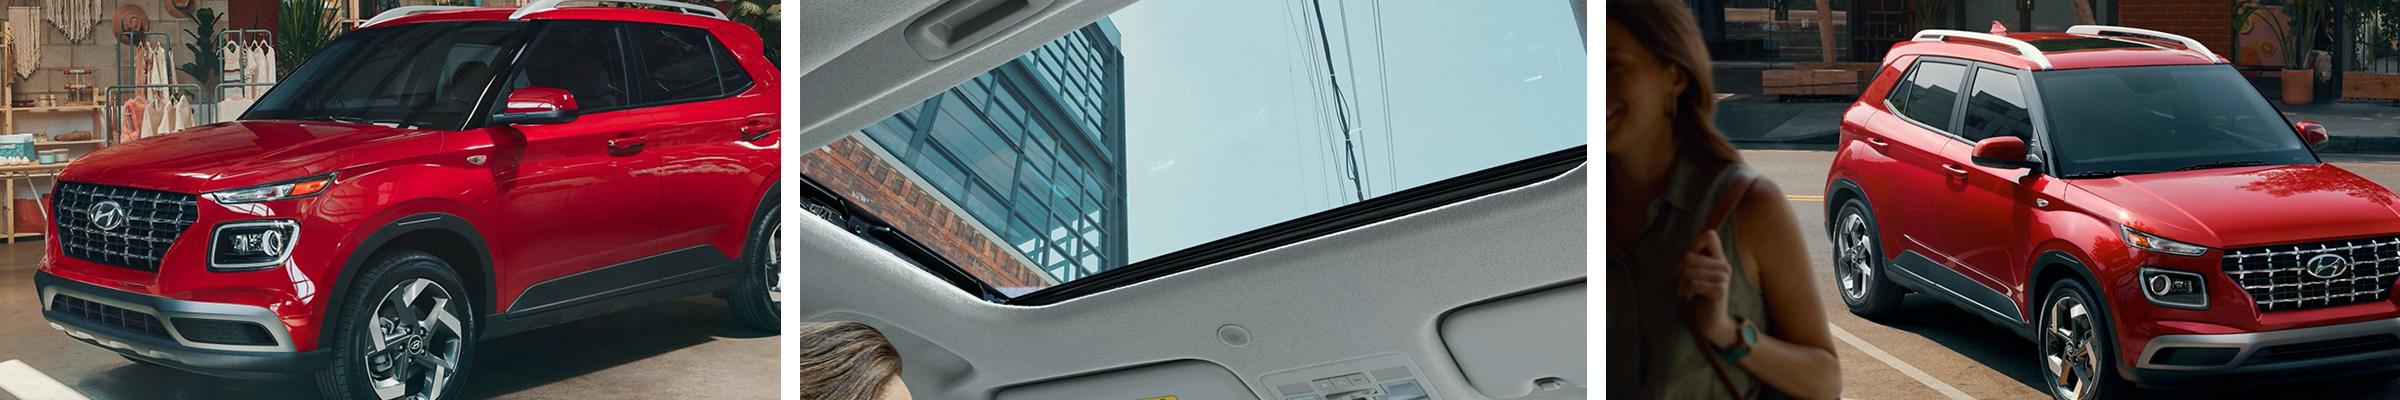 2021 Hyundai Venue For Sale Dearborn MI | Detroit